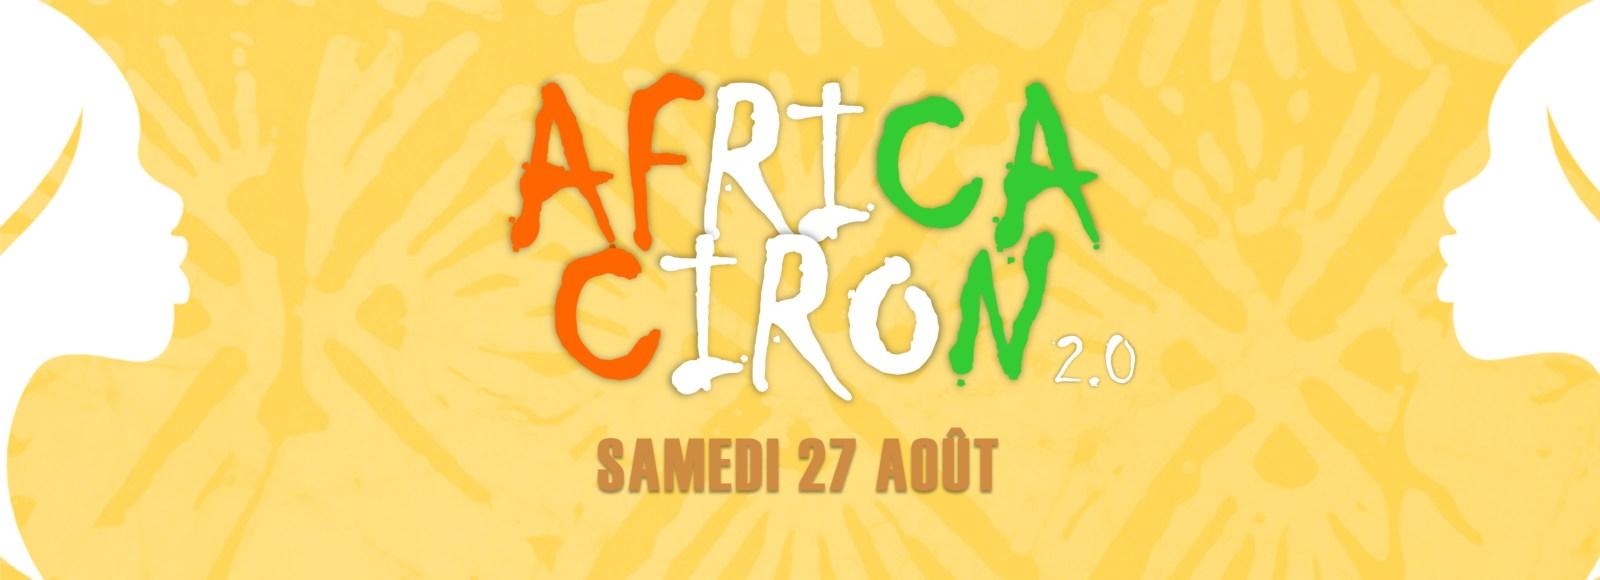 SLIDE Africa Ciron